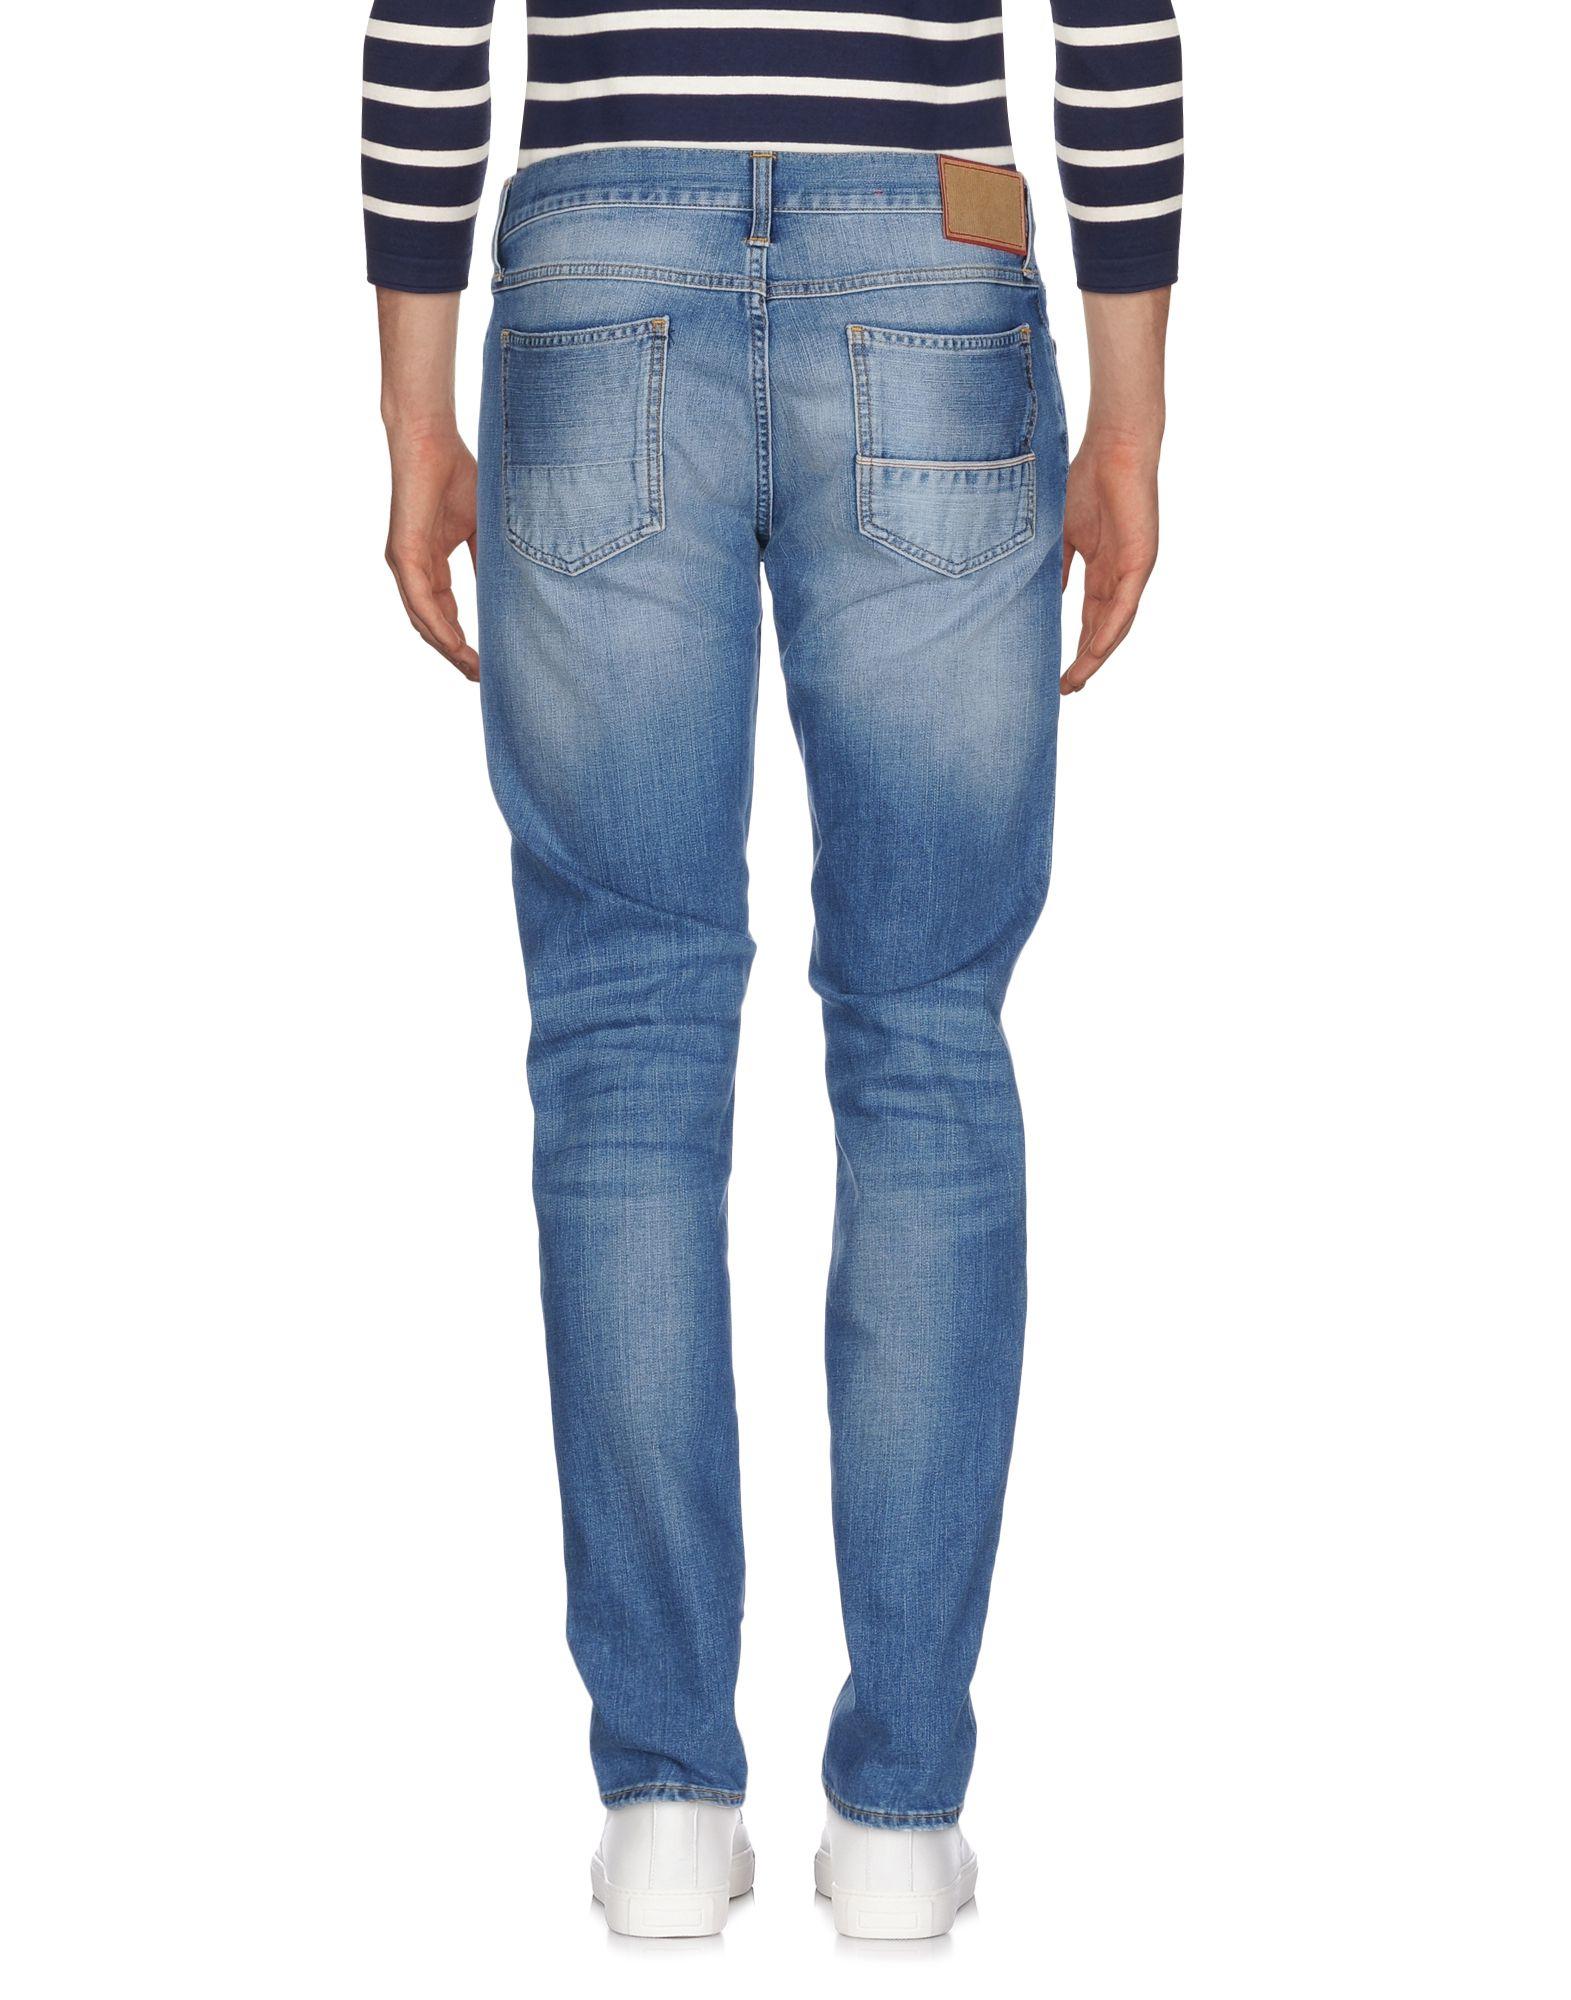 Pantaloni Jeans Jeans Jeans Care Label Uomo - 42656161KI 562189